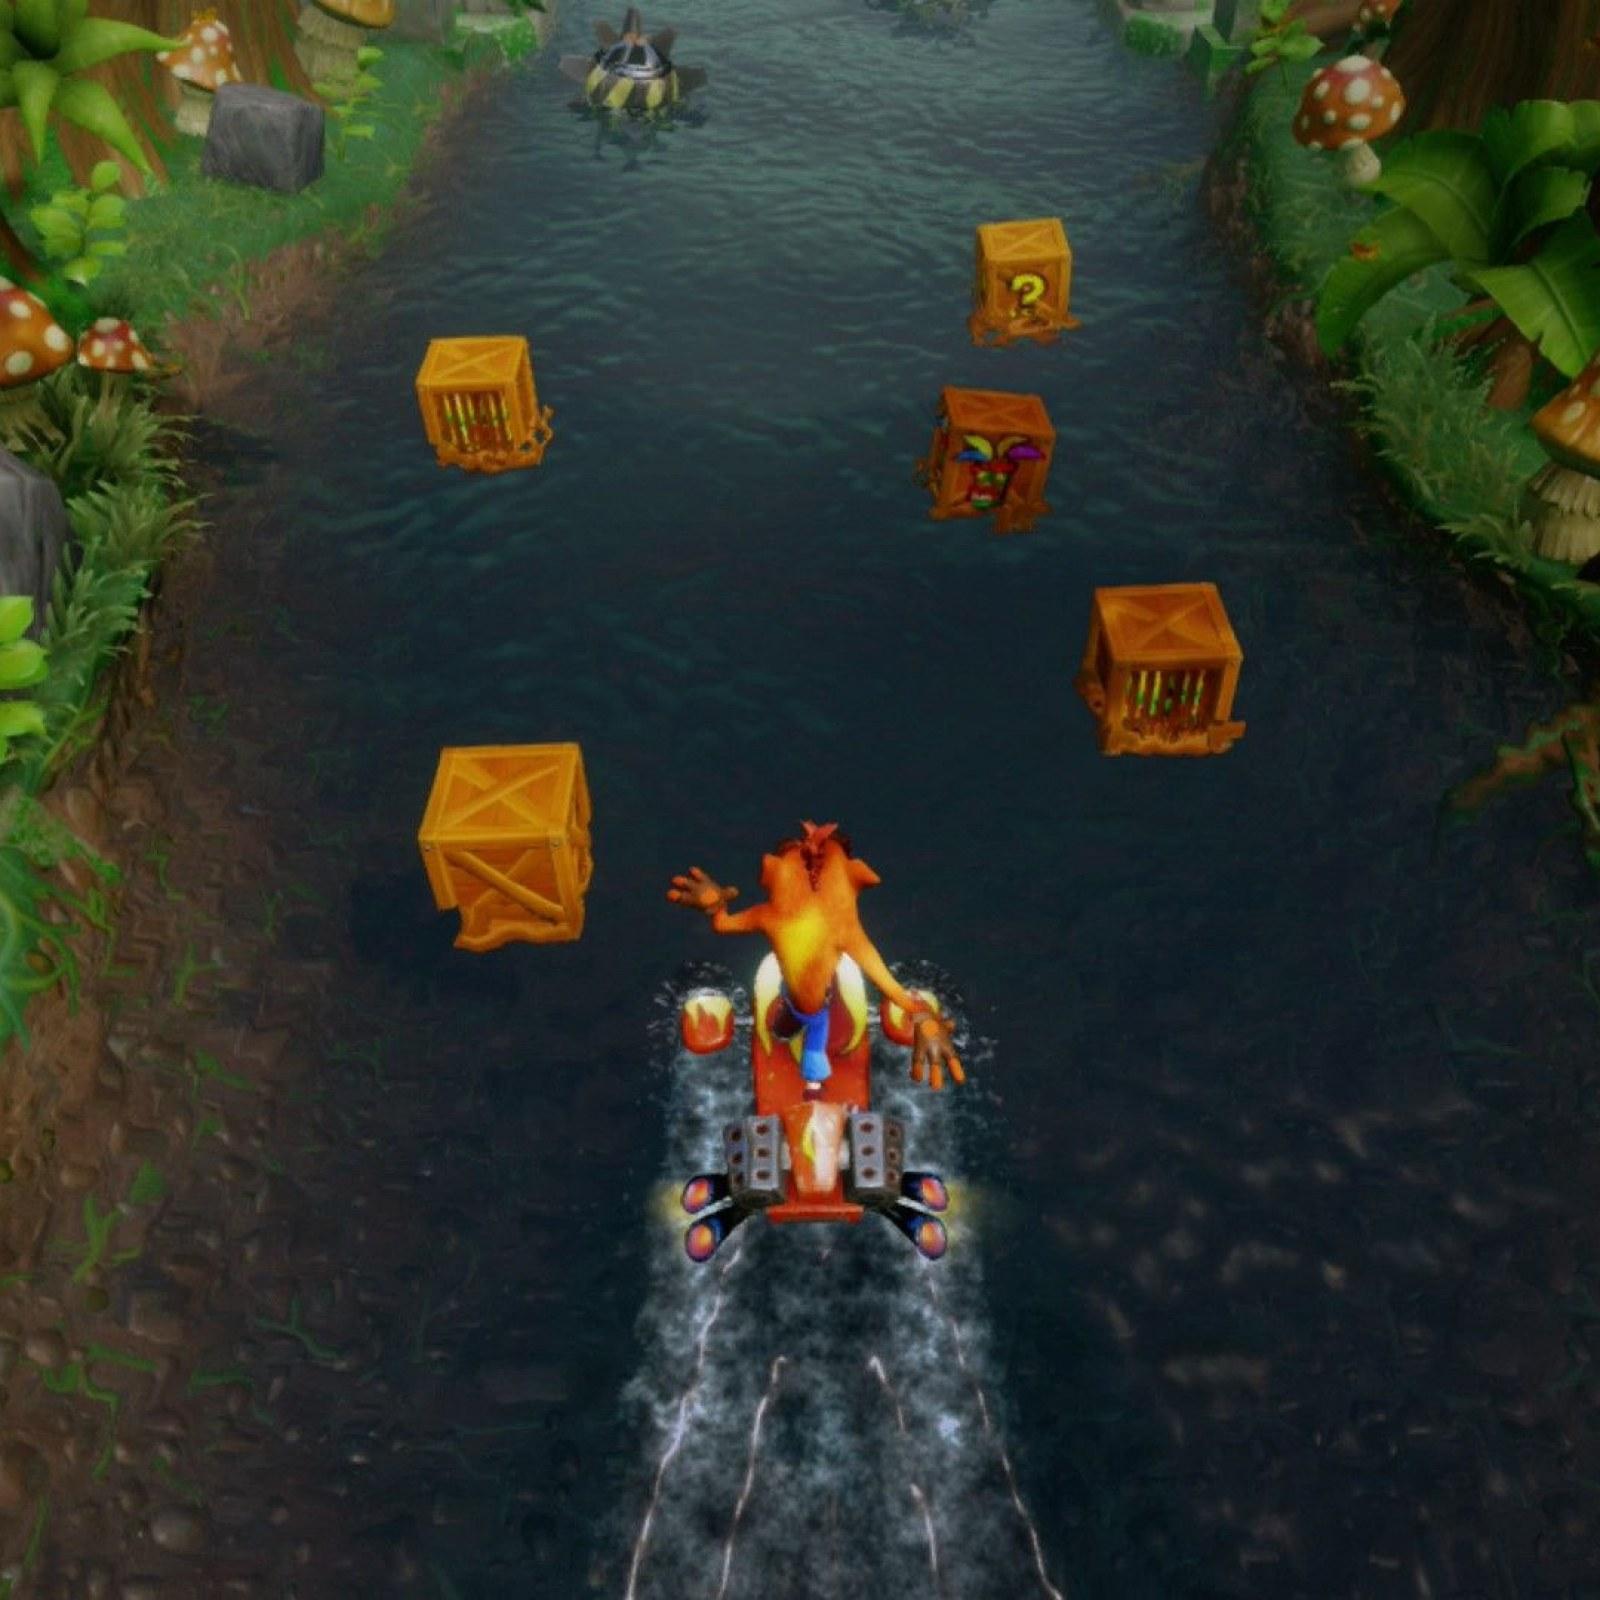 Crash Bandicoot N  Sane Trilogy' Switch Impressions - A